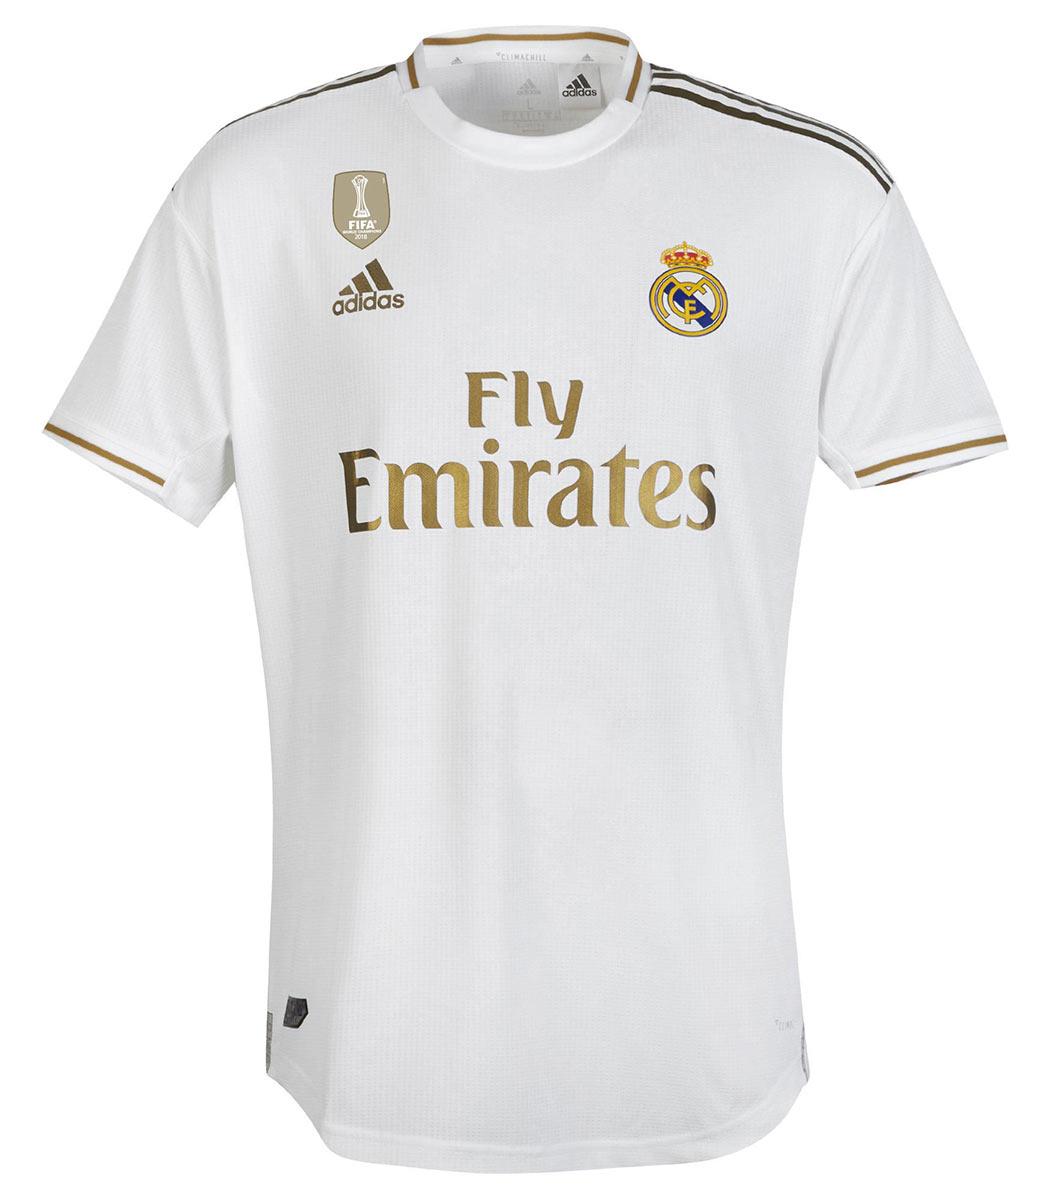 Maglie Real Madrid 2019-2020 adidas, il bianco sposa l'oro